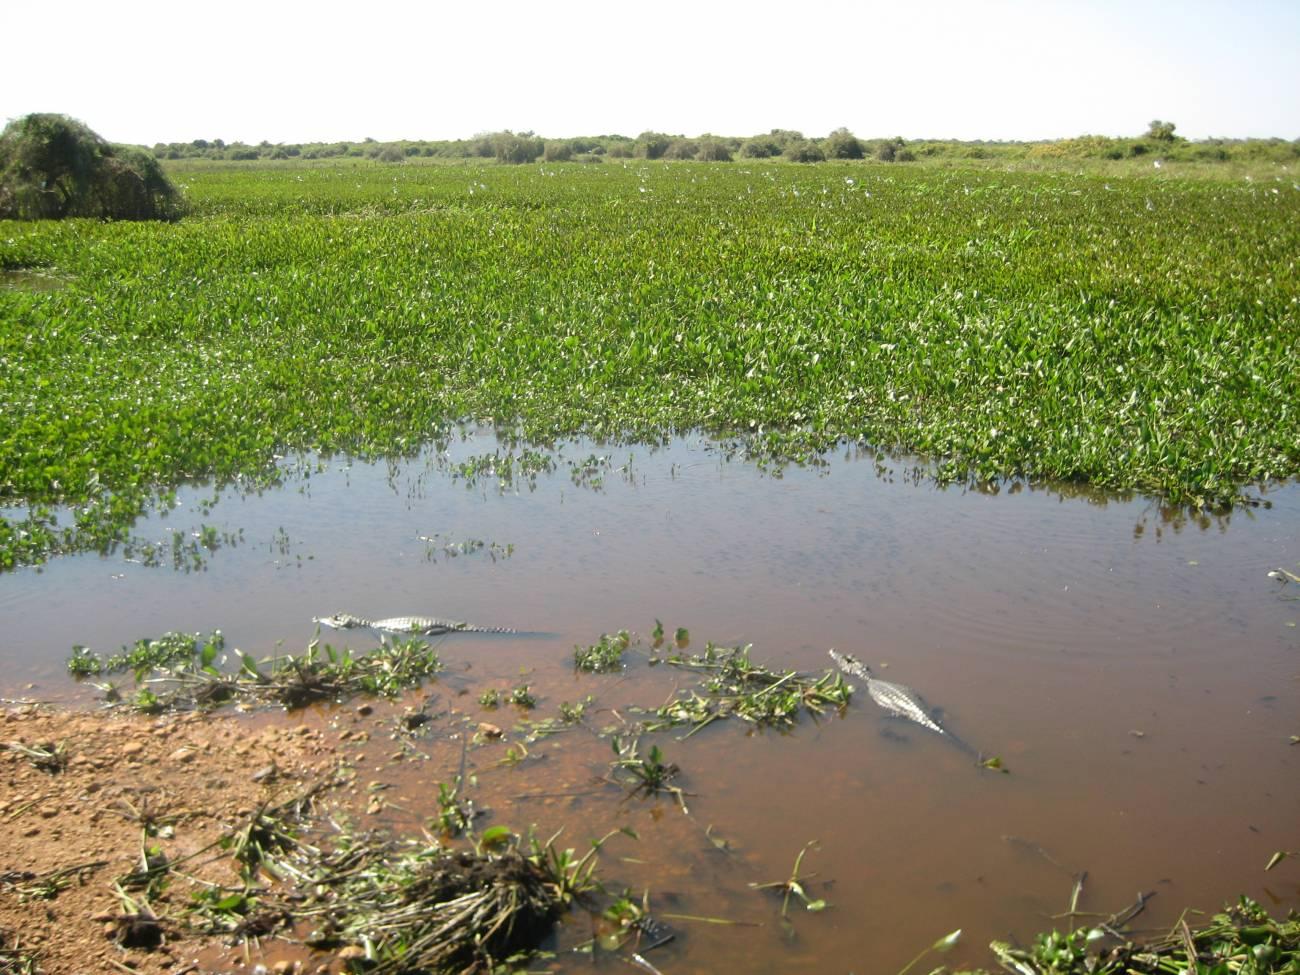 Humedal temporal en El Pantanal (Mato Grosso, Brasil). Imagen: Francisco A. Comín Serrano / CSIC.